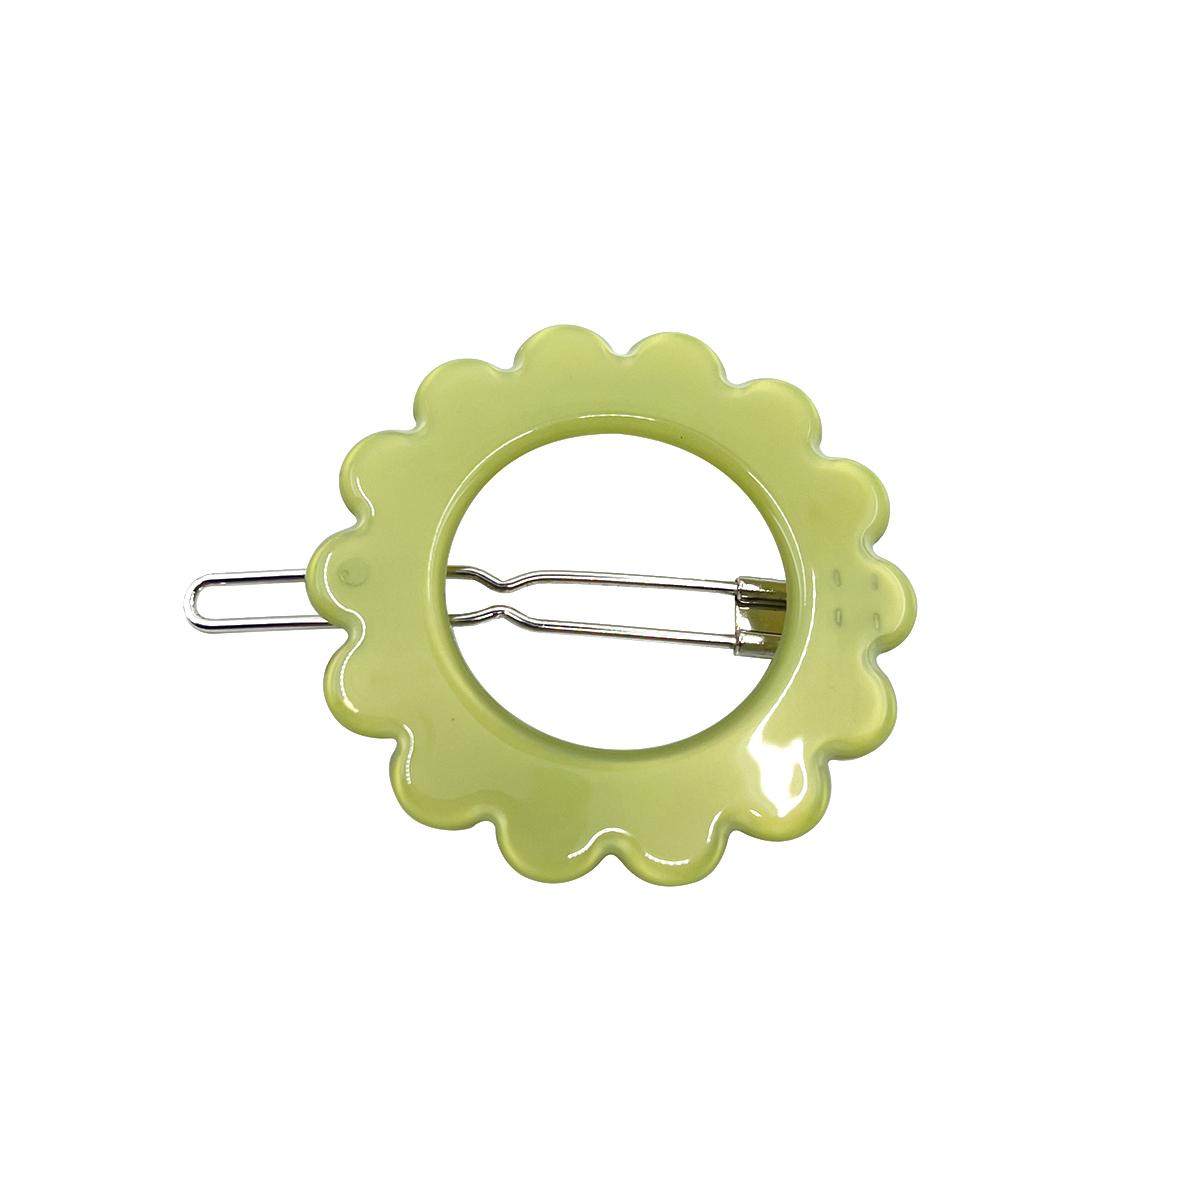 Green Copenhagen hair clip by Inky and Mole